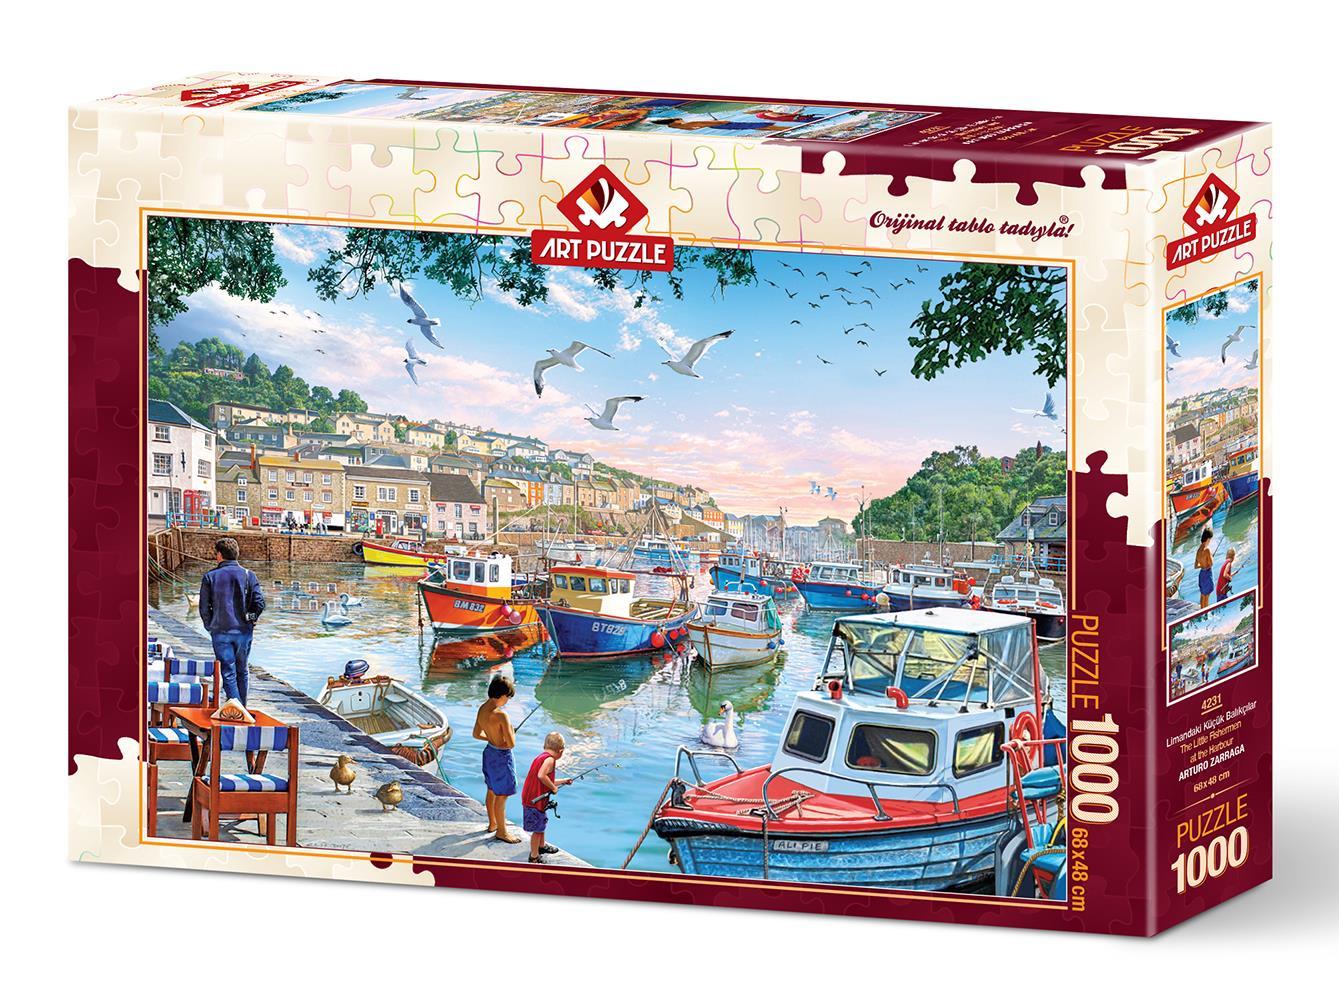 Art Puzzle 4231 Limandaki Küçük Balıkçılar 1000 Parça Puzzle